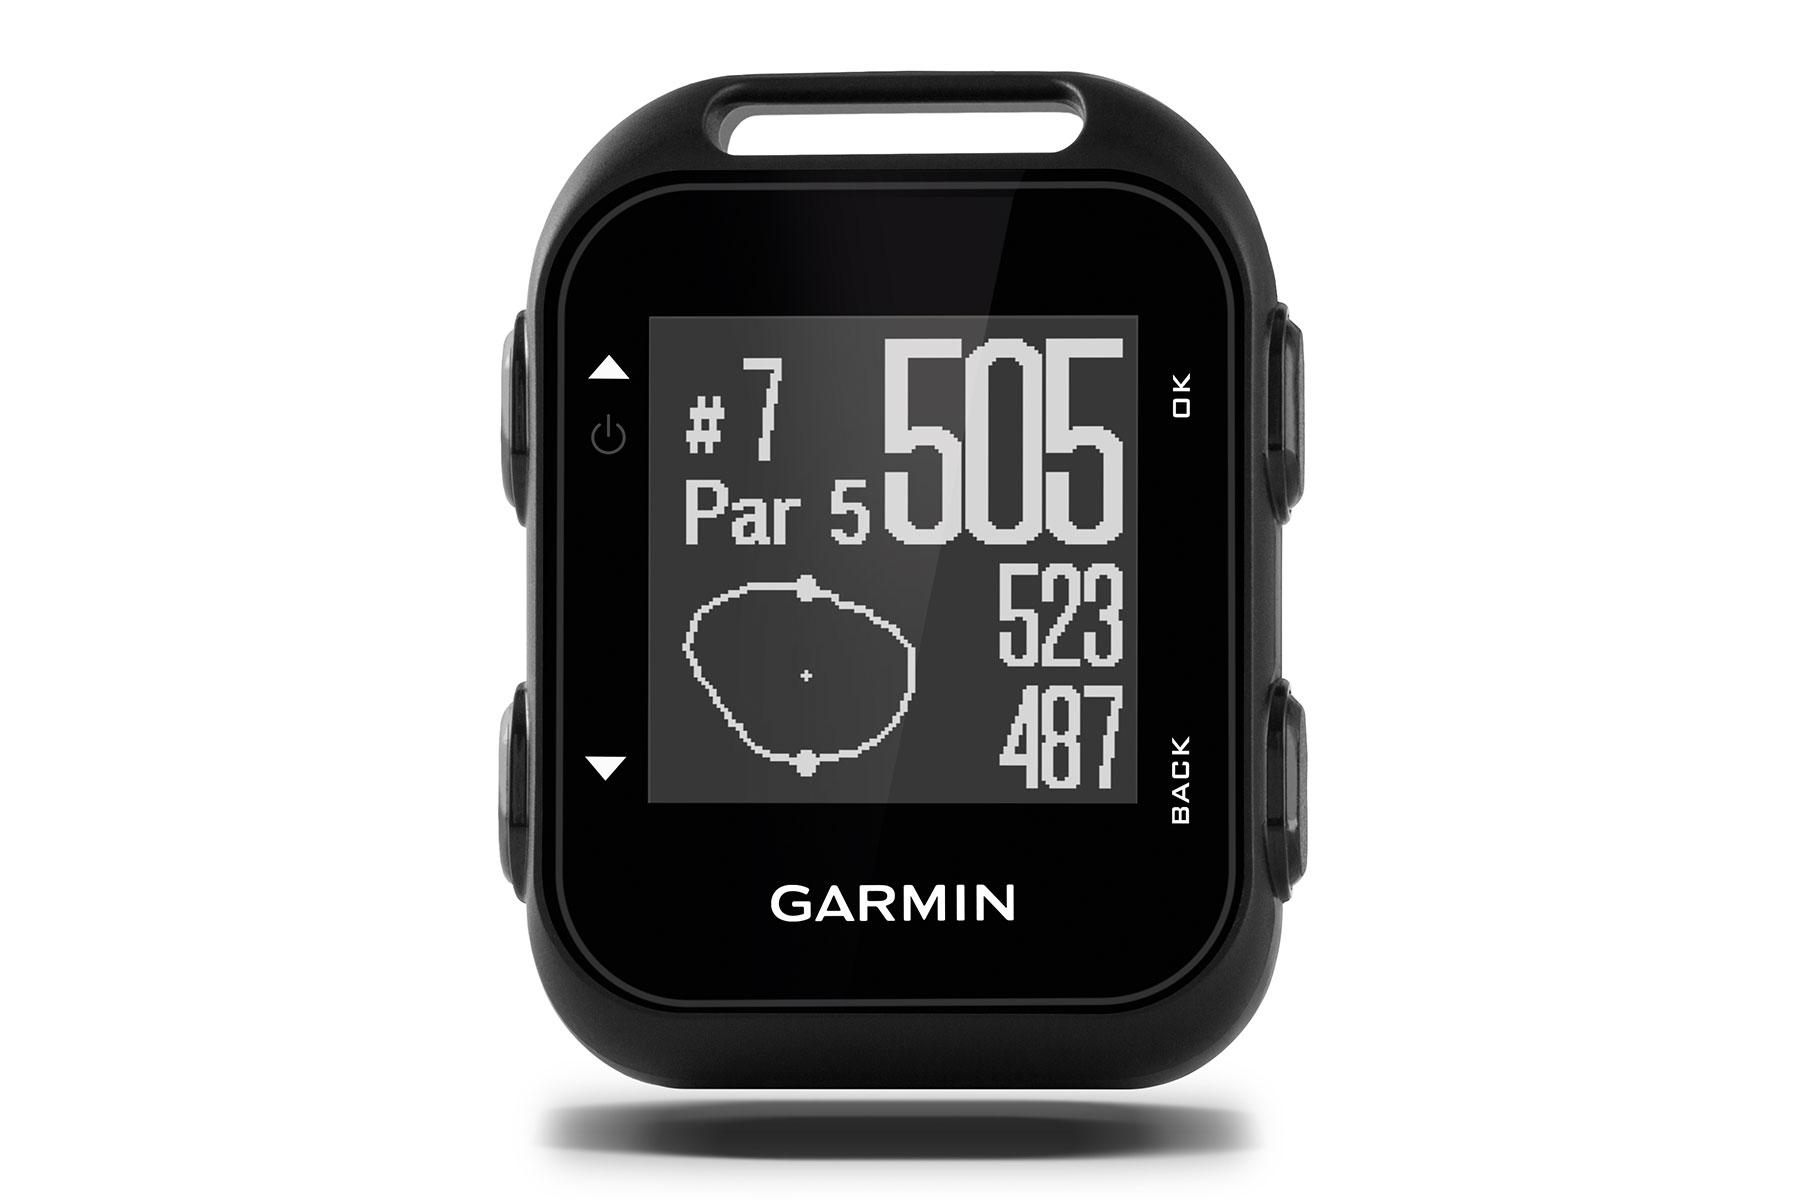 Garmin golf gps reviews